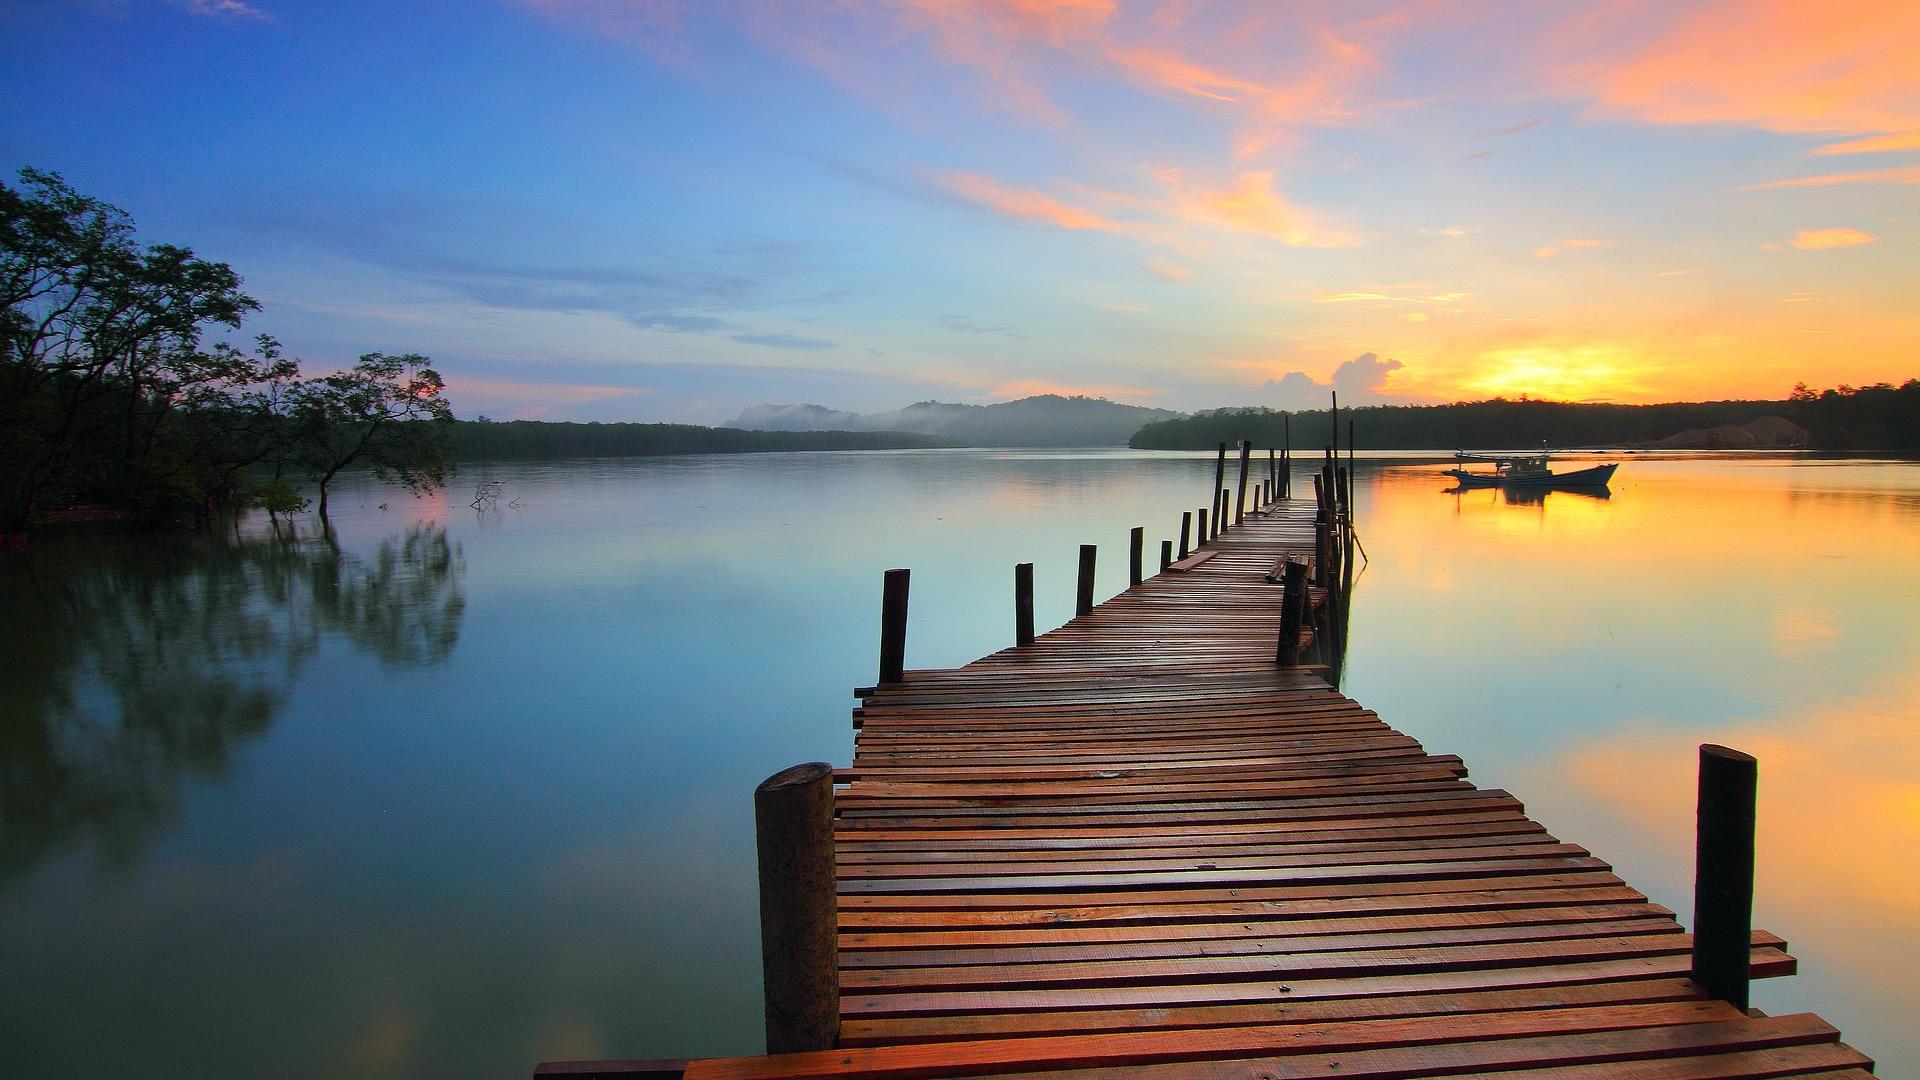 lake sunrise hd wallpaper